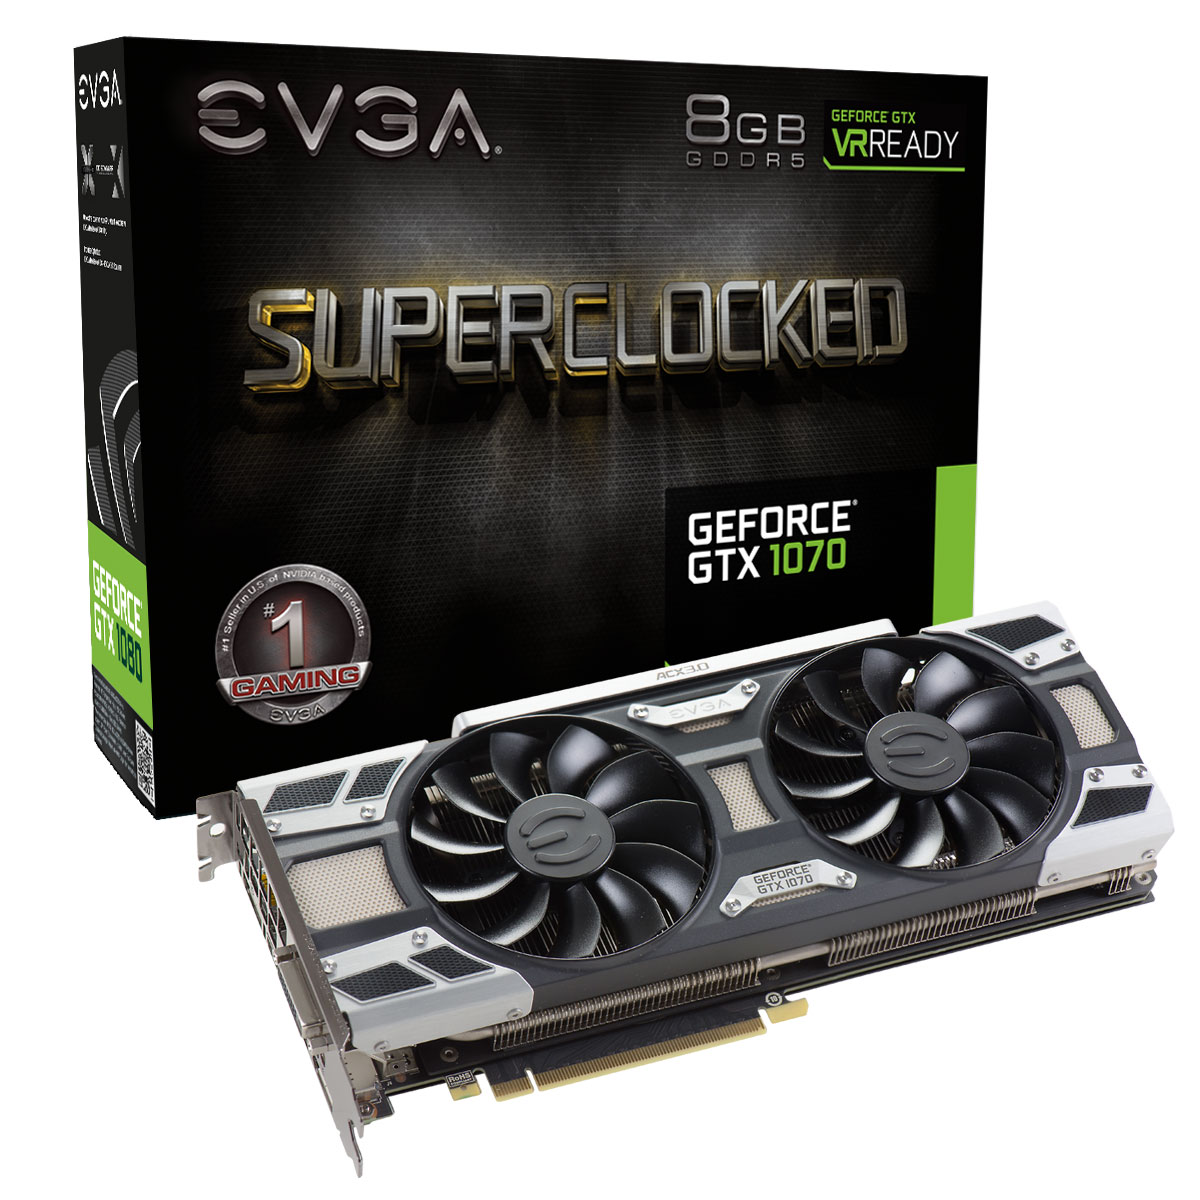 Carte graphique EVGA GeForce GTX 1070 SC GAMING ACX 3.0 8192 Mo DVI/HDMI/Tri DisplayPort - PCI Express (NVIDIA GeForce avec CUDA GTX 1070)